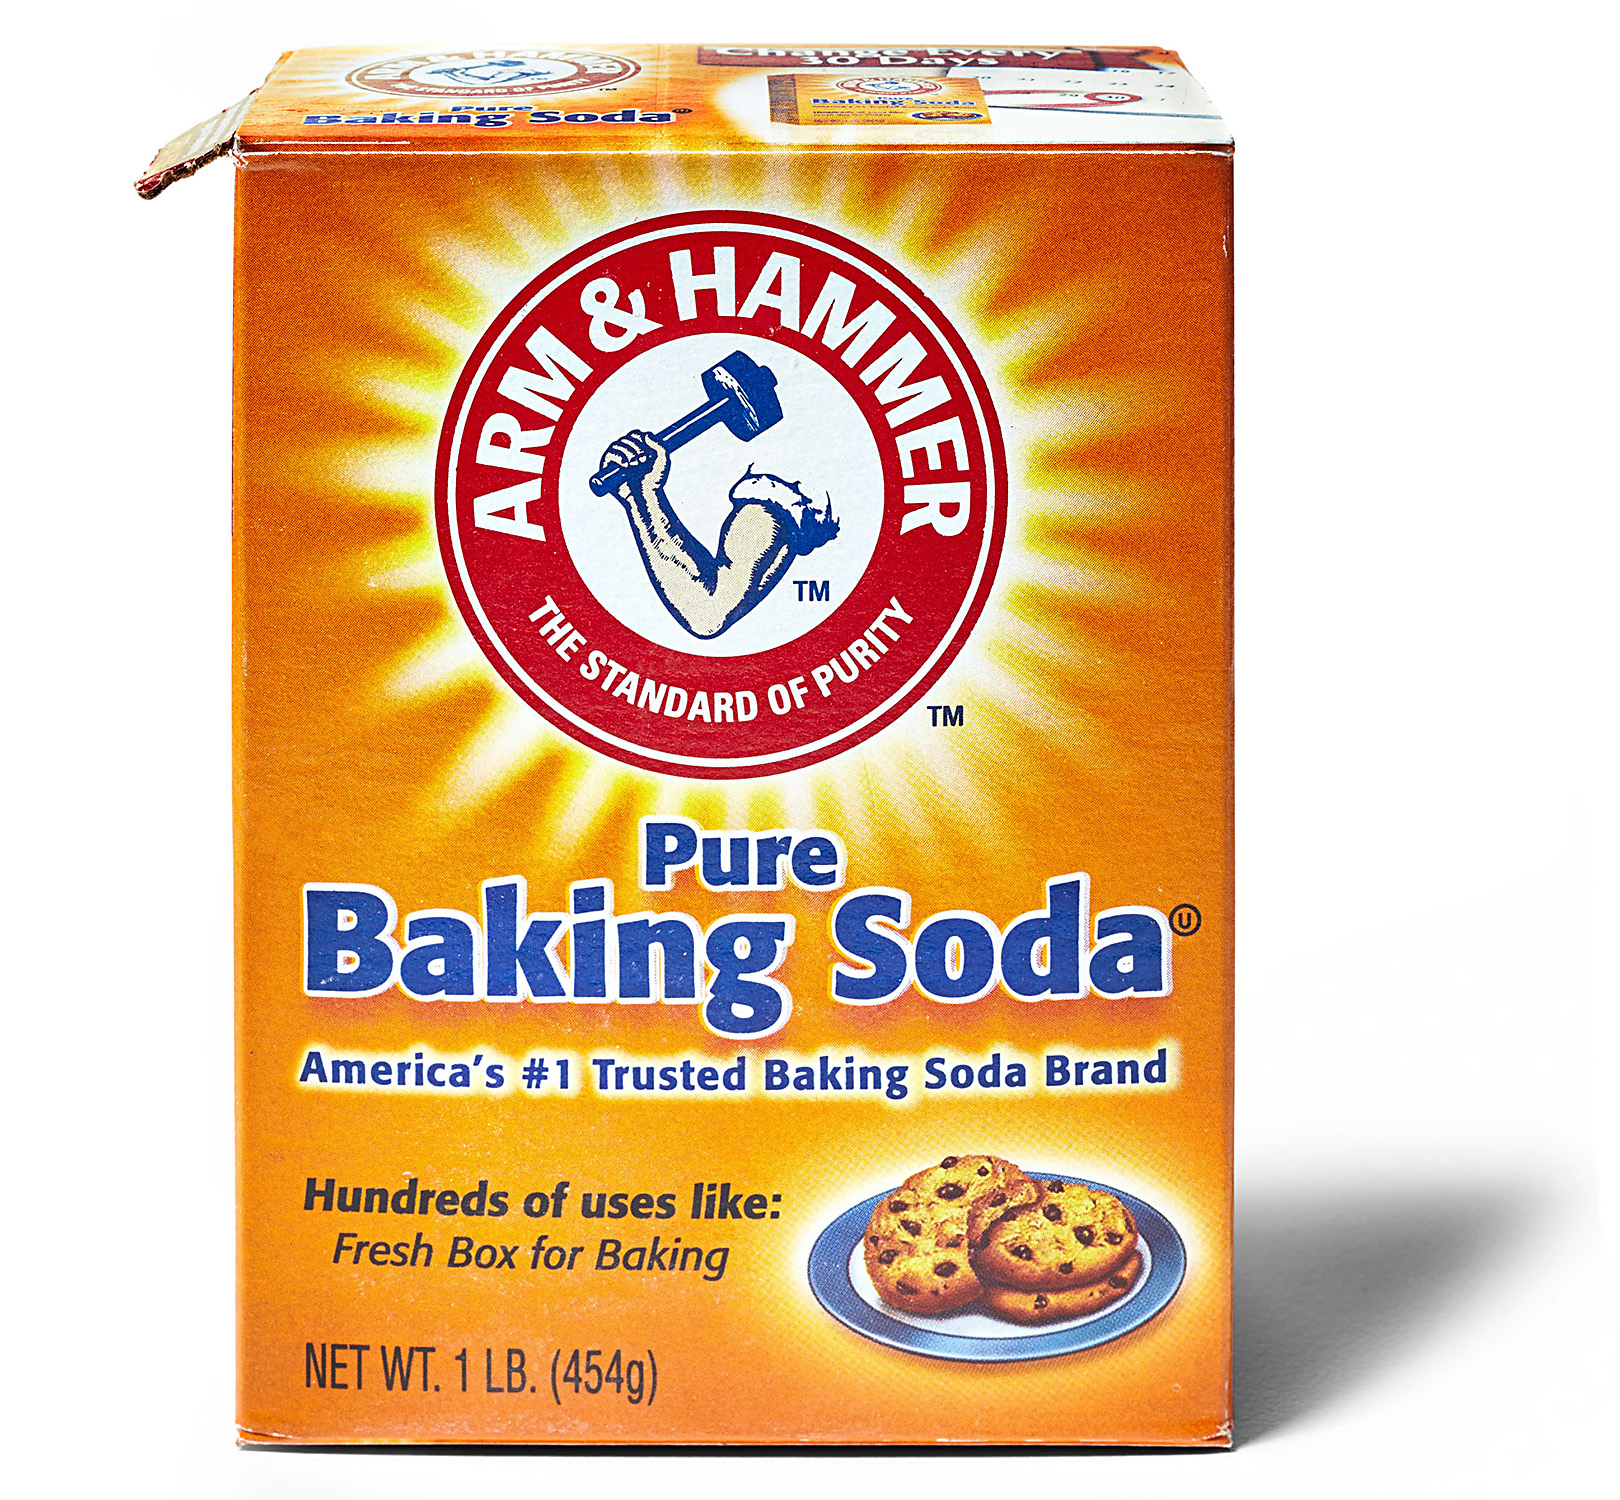 box of Arm & Hammer Pure Baking Soda